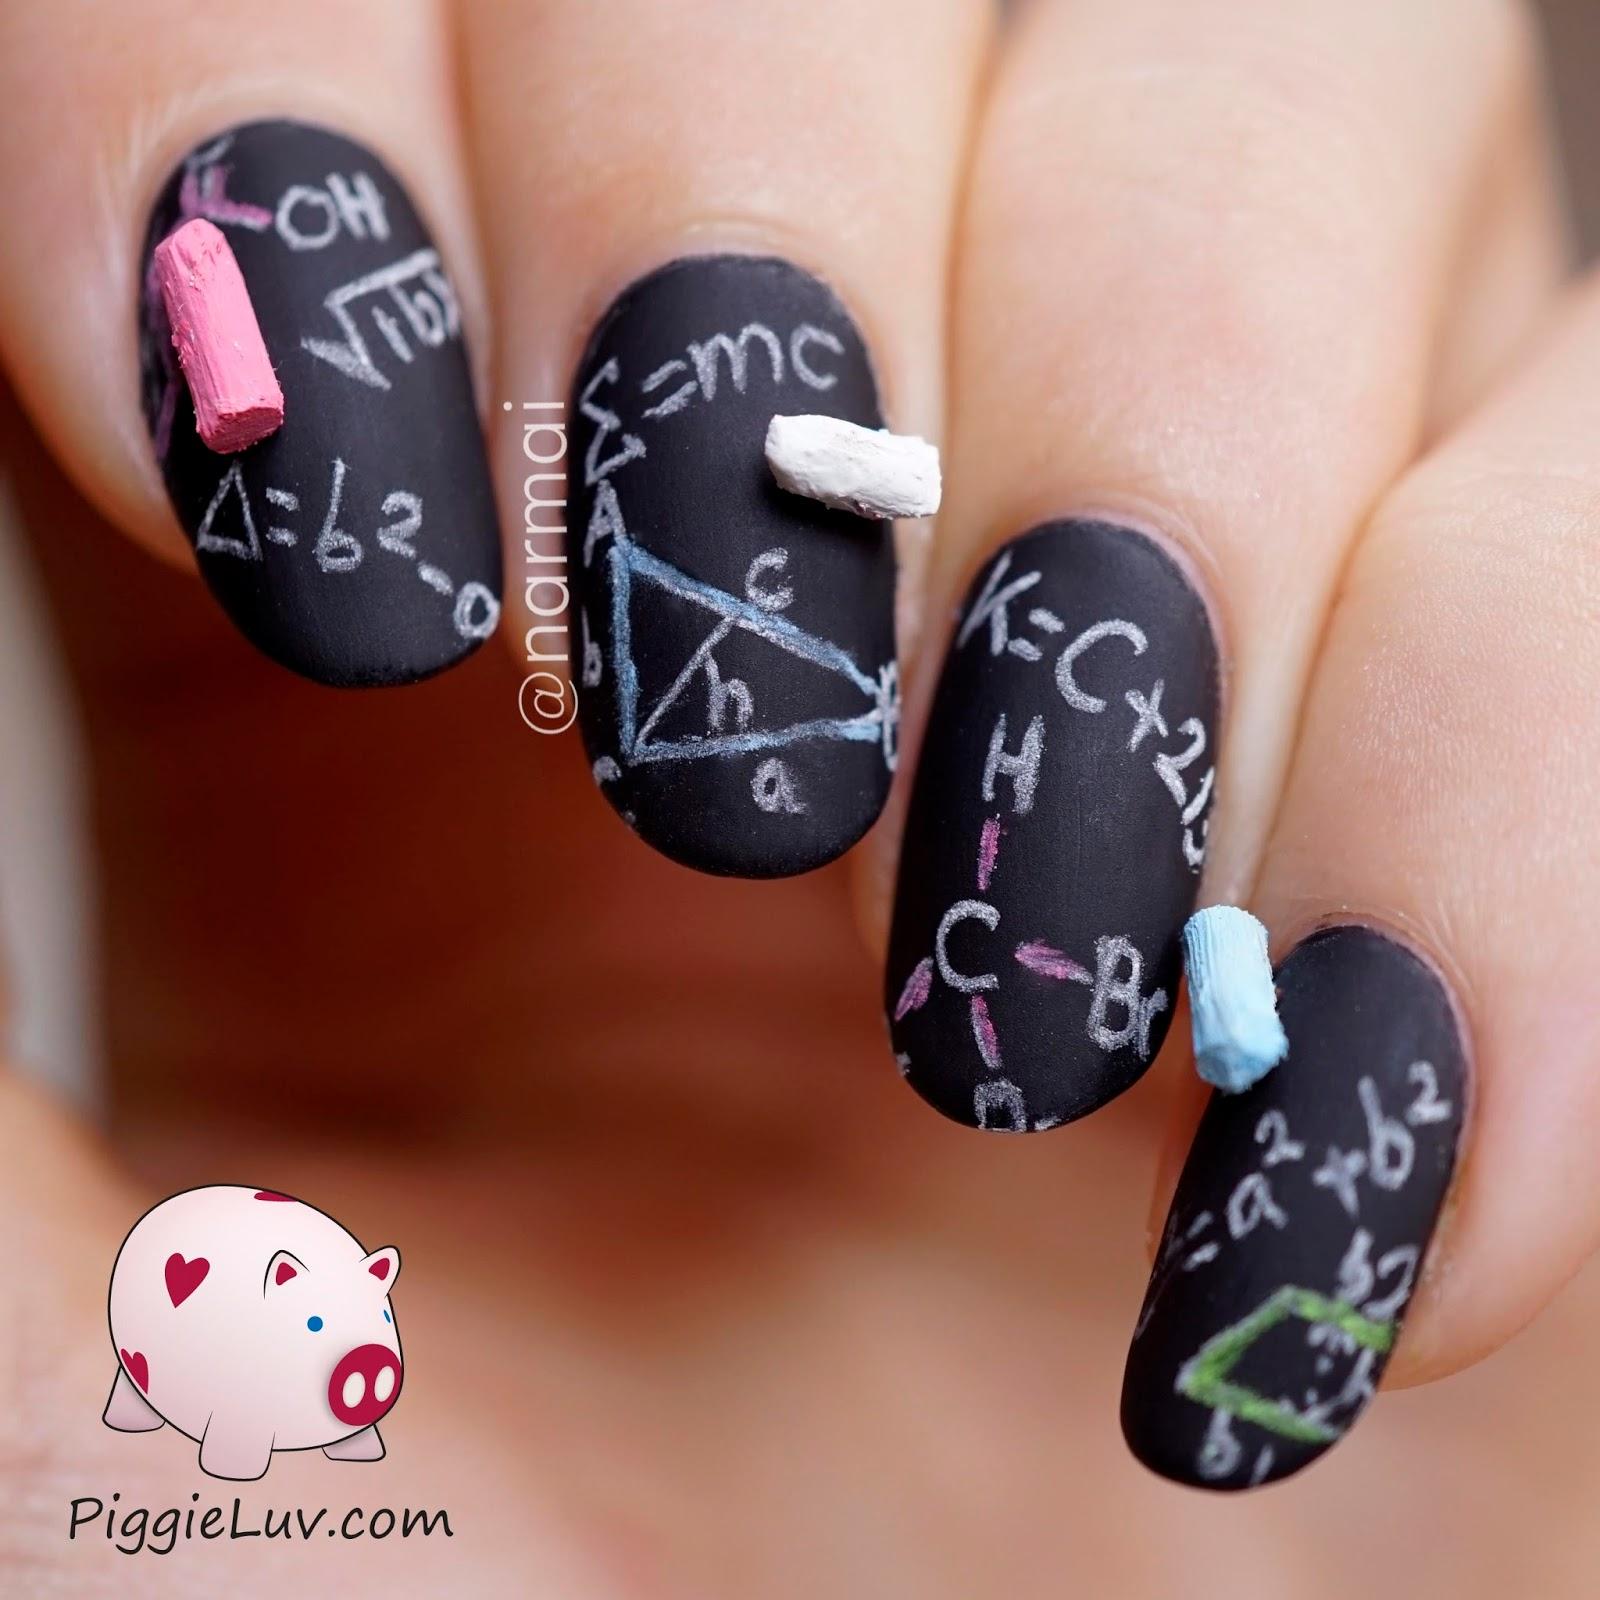 Crazy Nail Art: PiggieLuv: January 2015